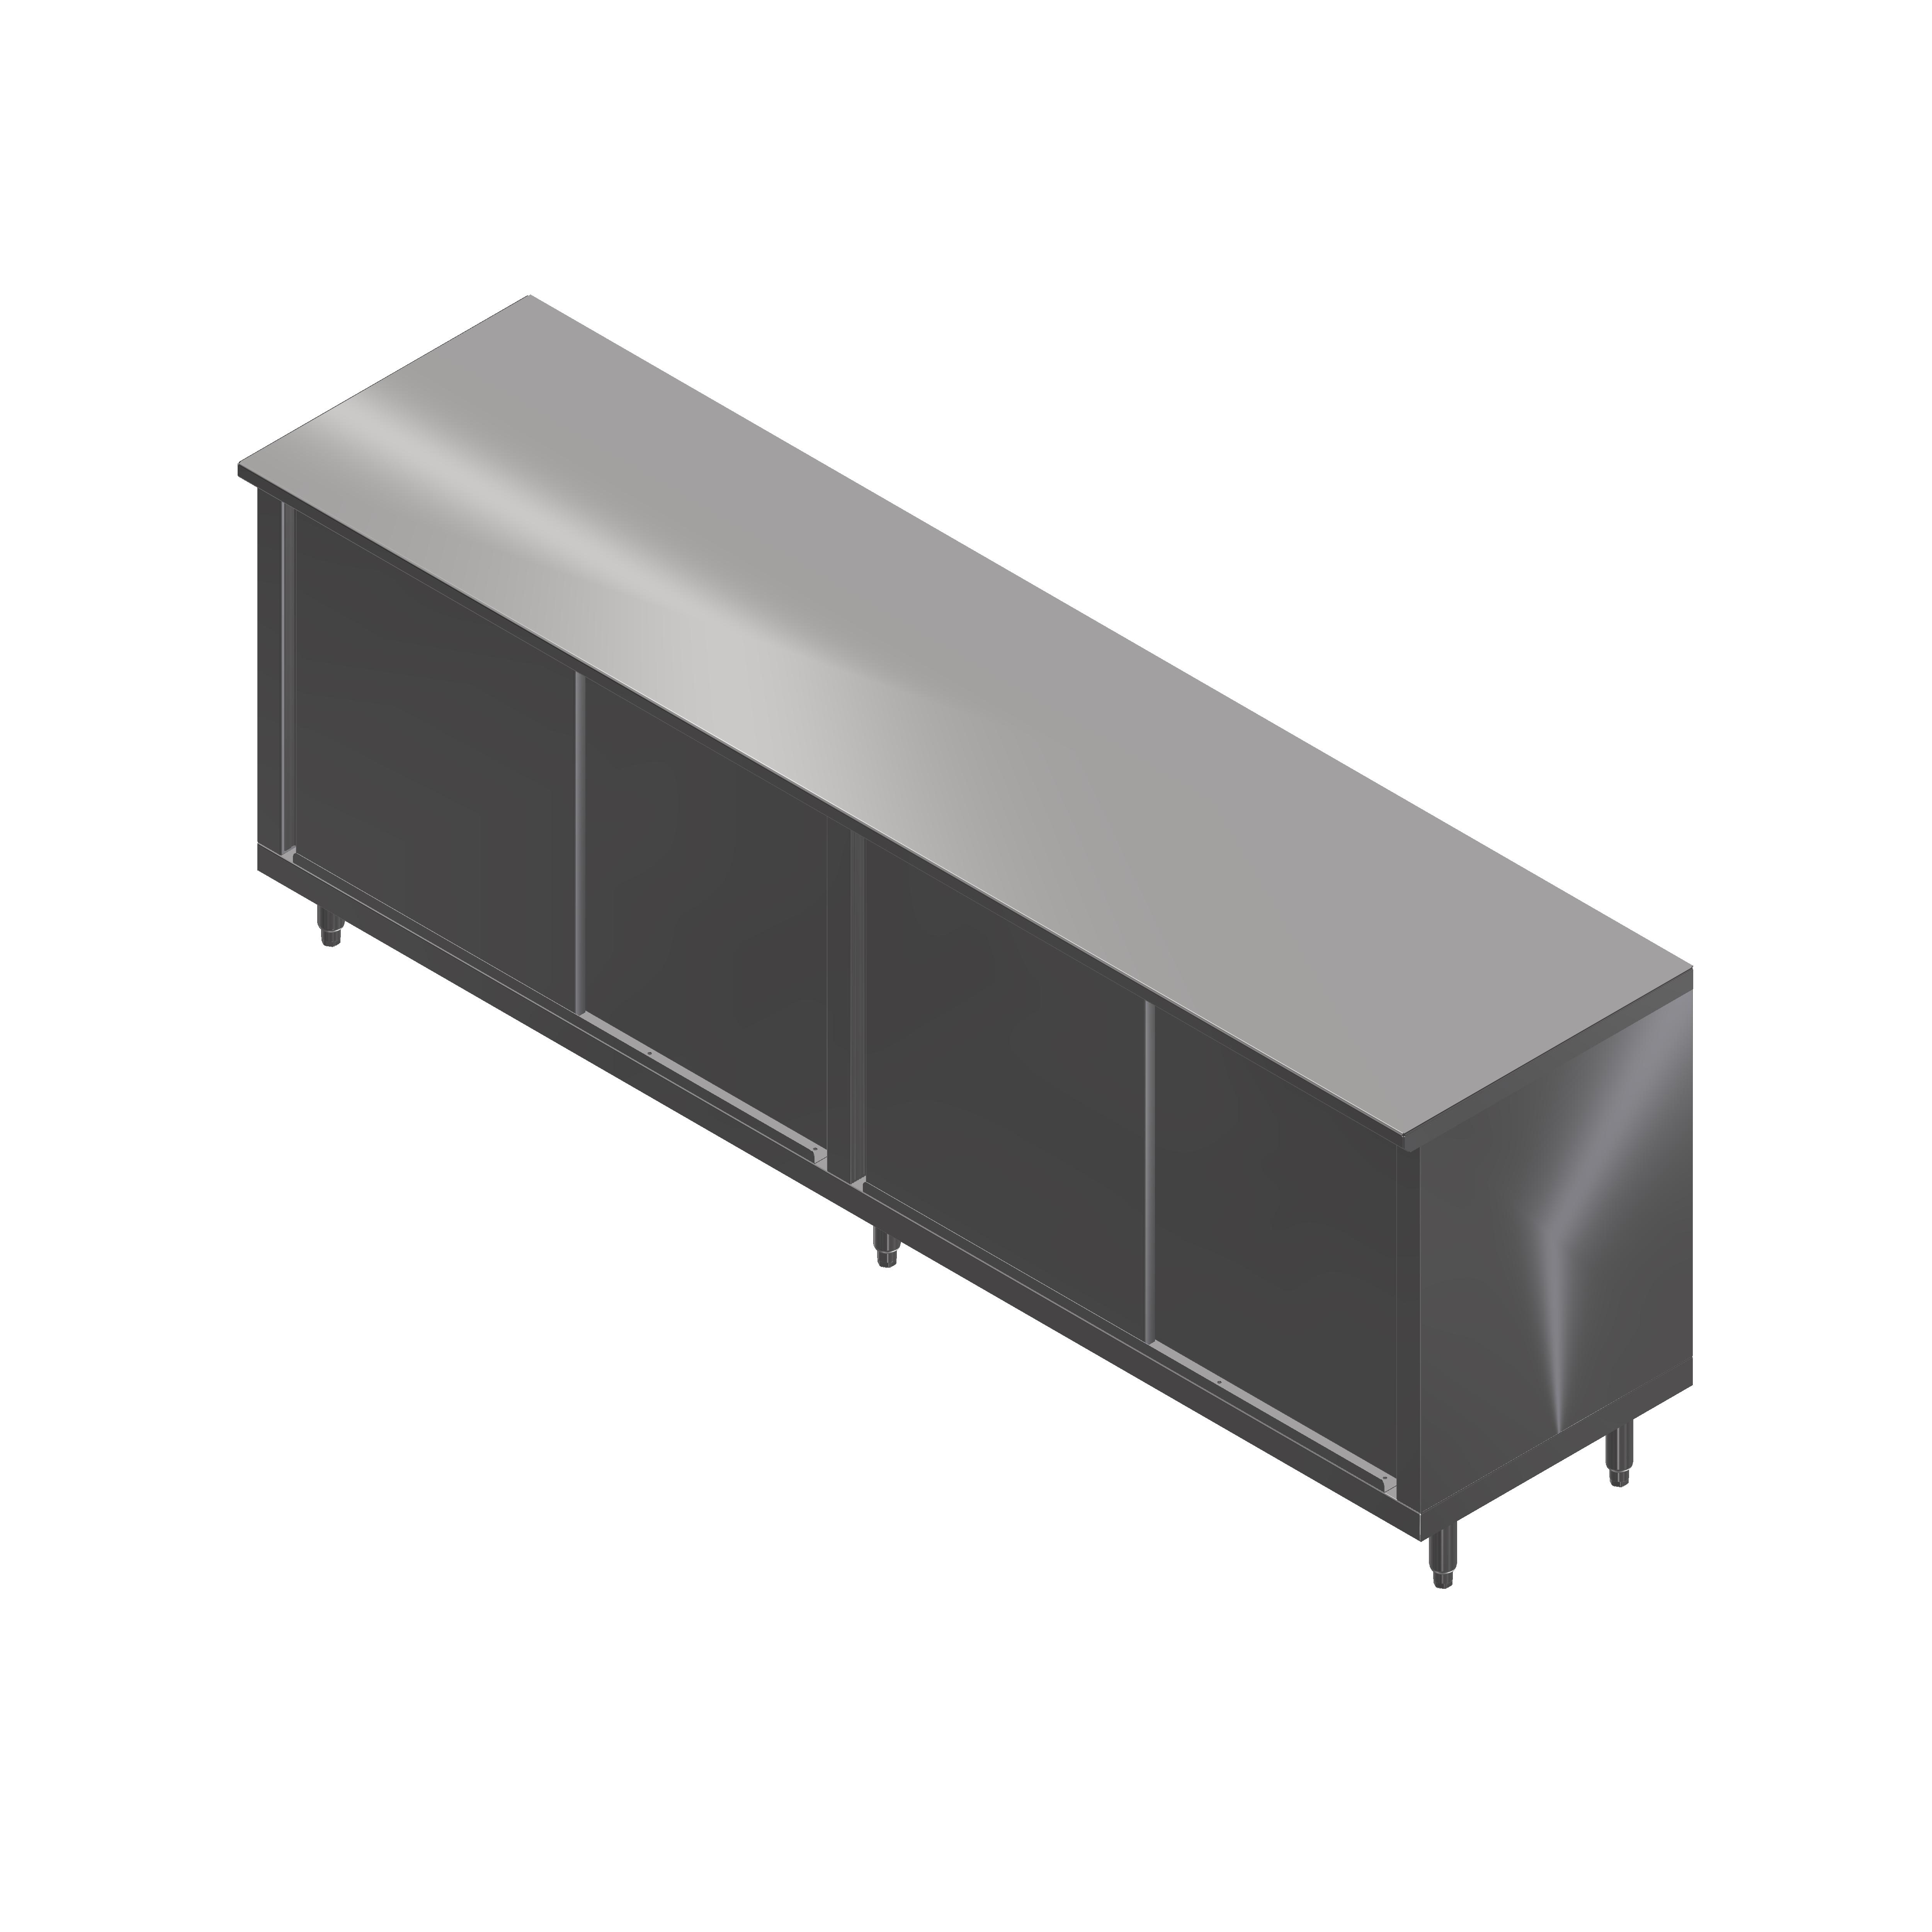 John Boos 4CS4-30144 work table, cabinet base sliding doors